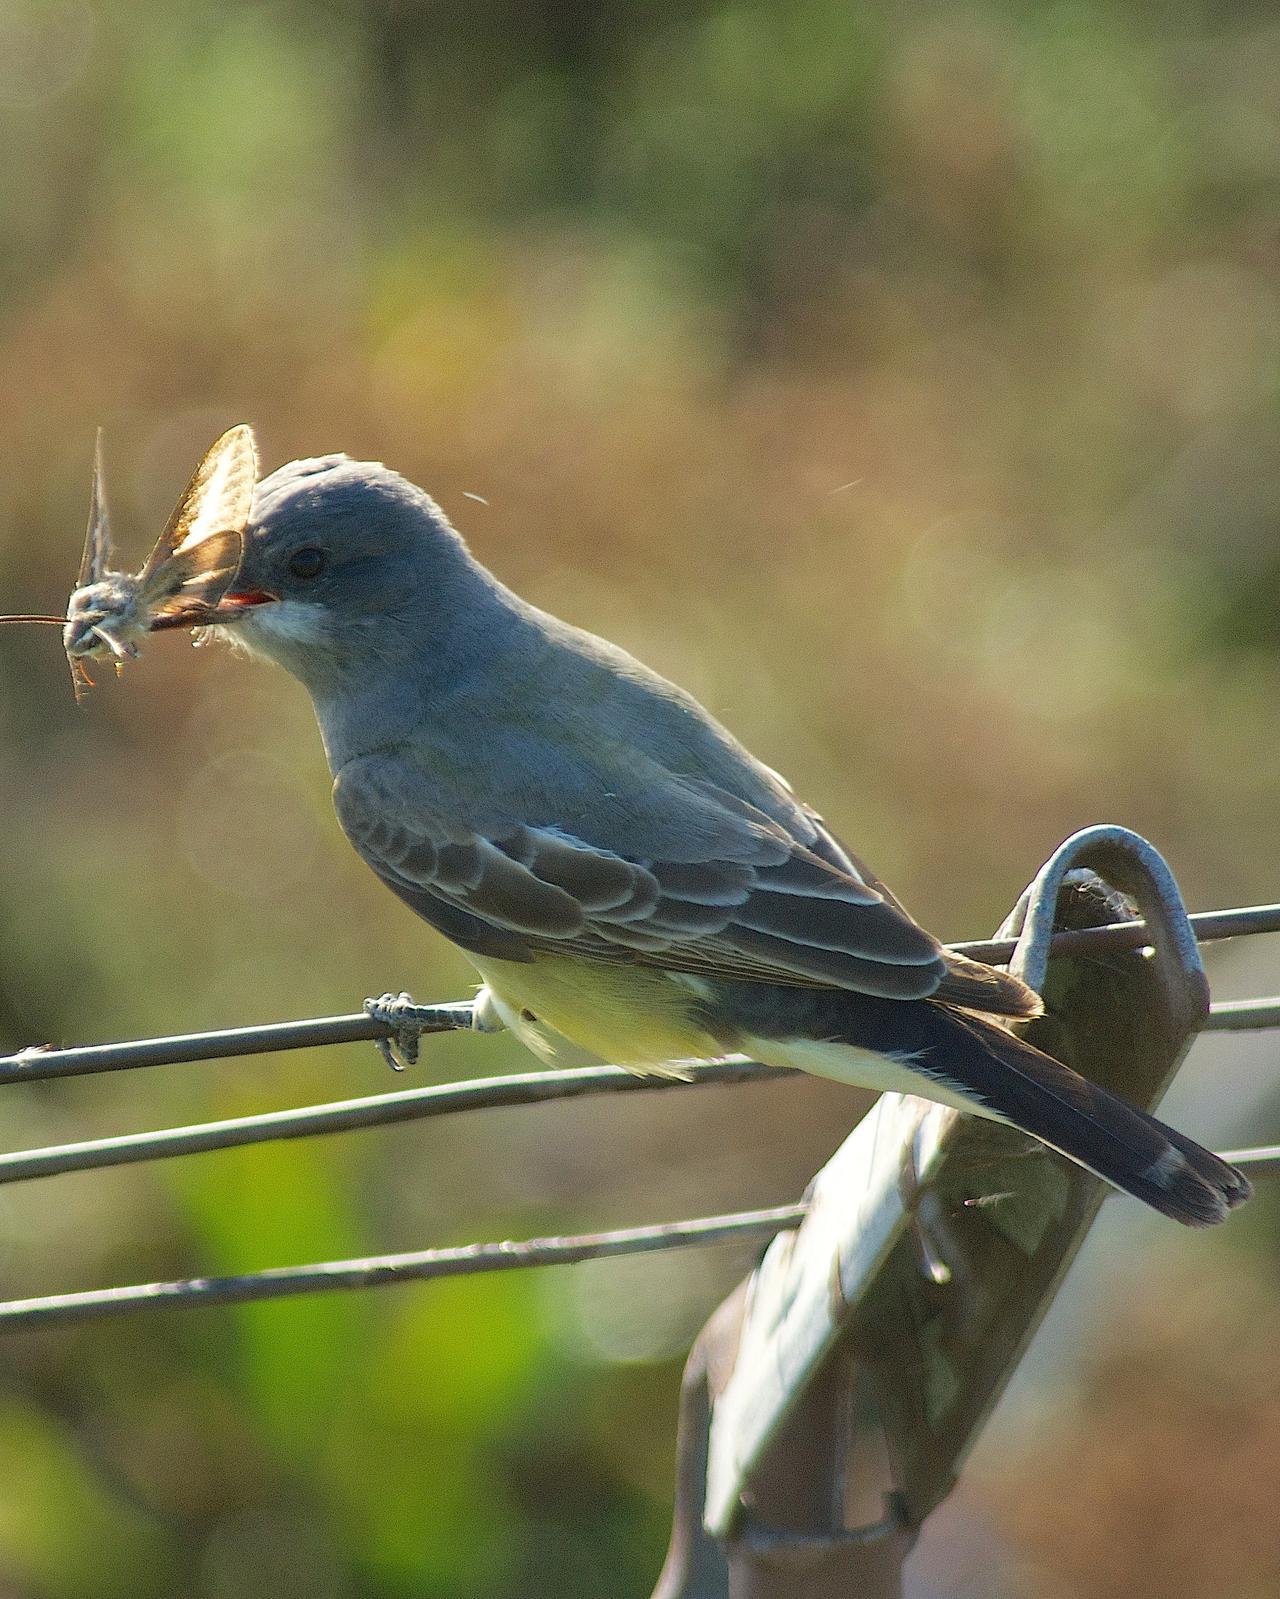 Cassin's Kingbird Photo by Gerald Hoekstra